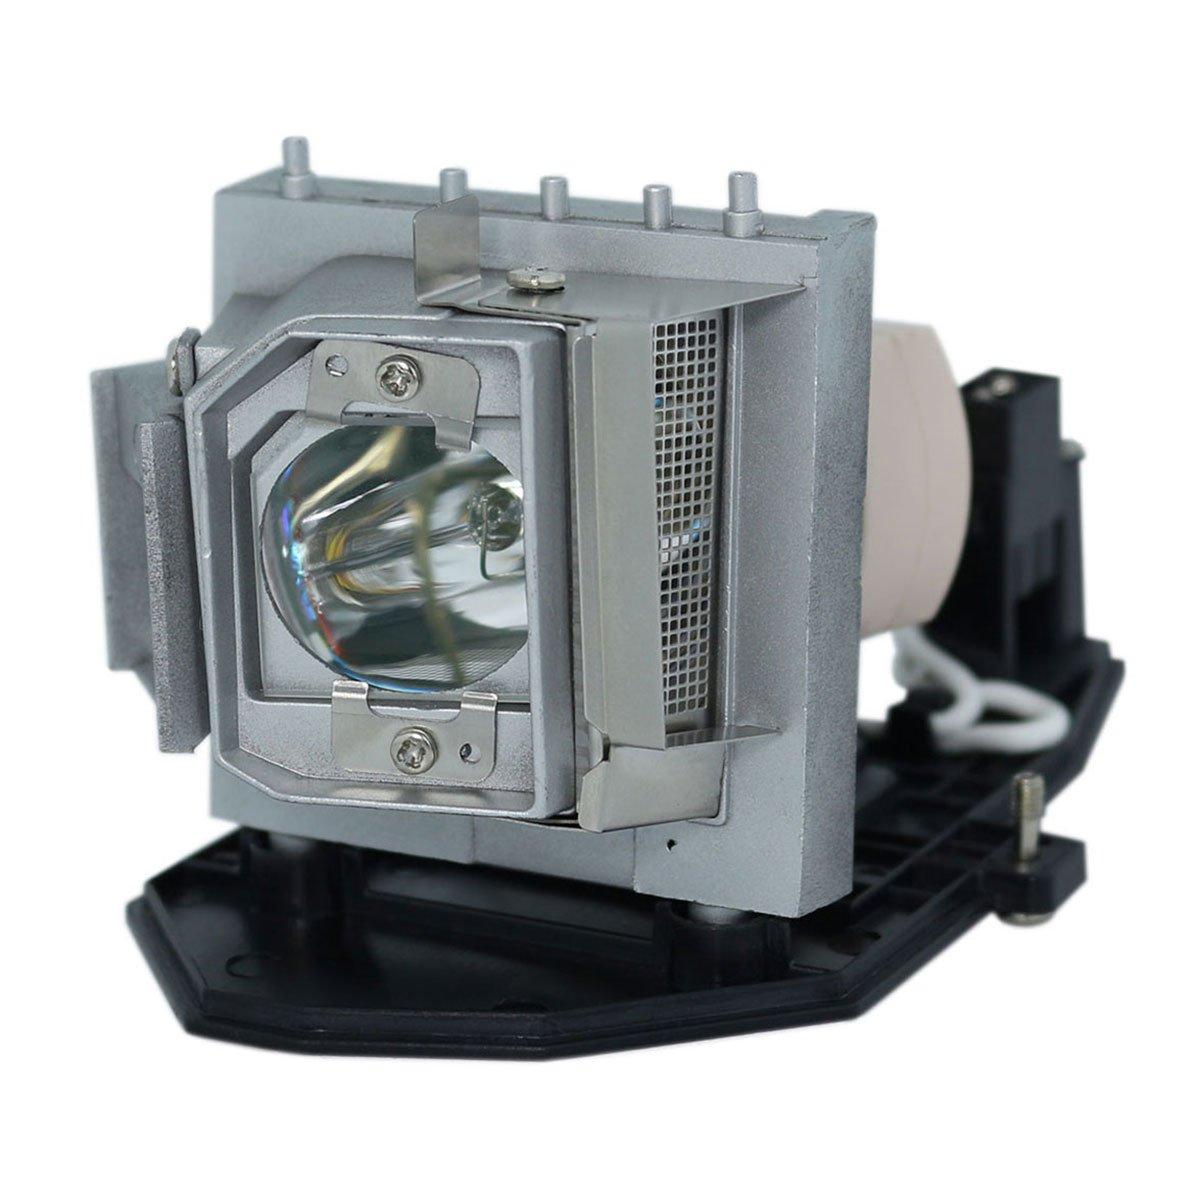 SpArc プロジェクター交換用ランプ 囲い/電球付き Optoma TX635-3D用 Economy B07MPTFRKK Lamp with Housing Economy